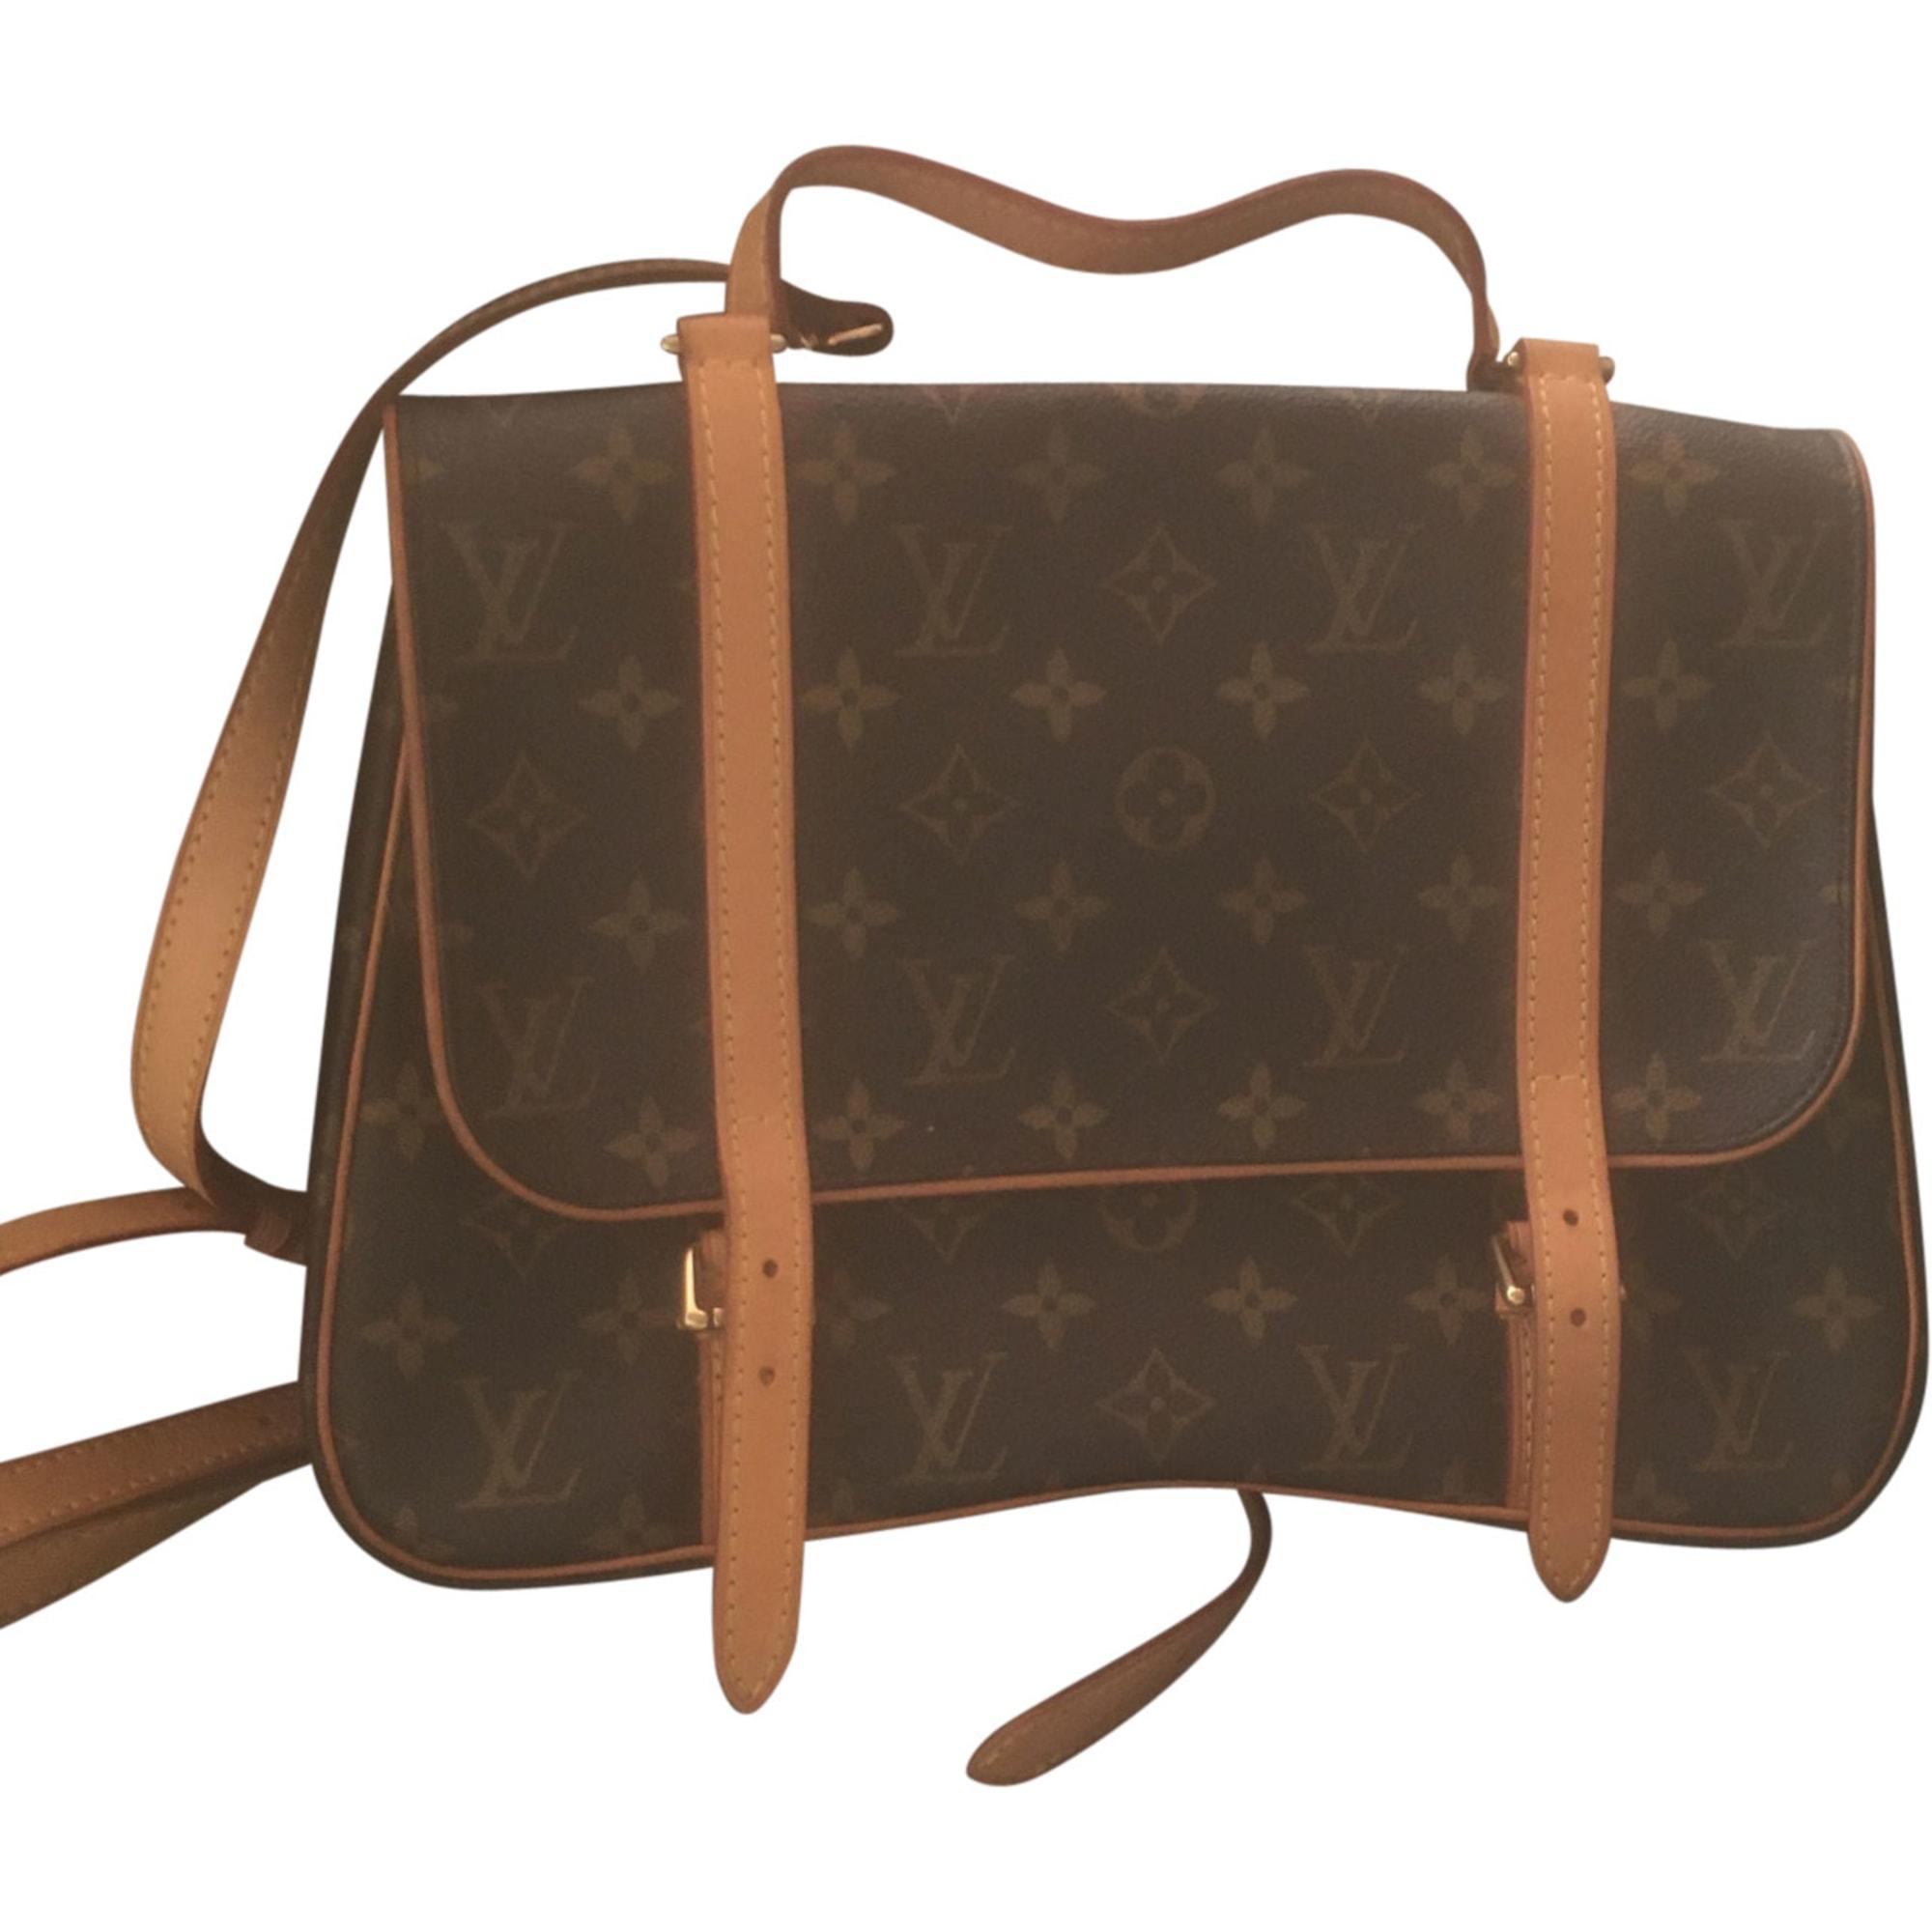 Leather Handbag LOUIS VUITTON Monogramme louis Vuitton